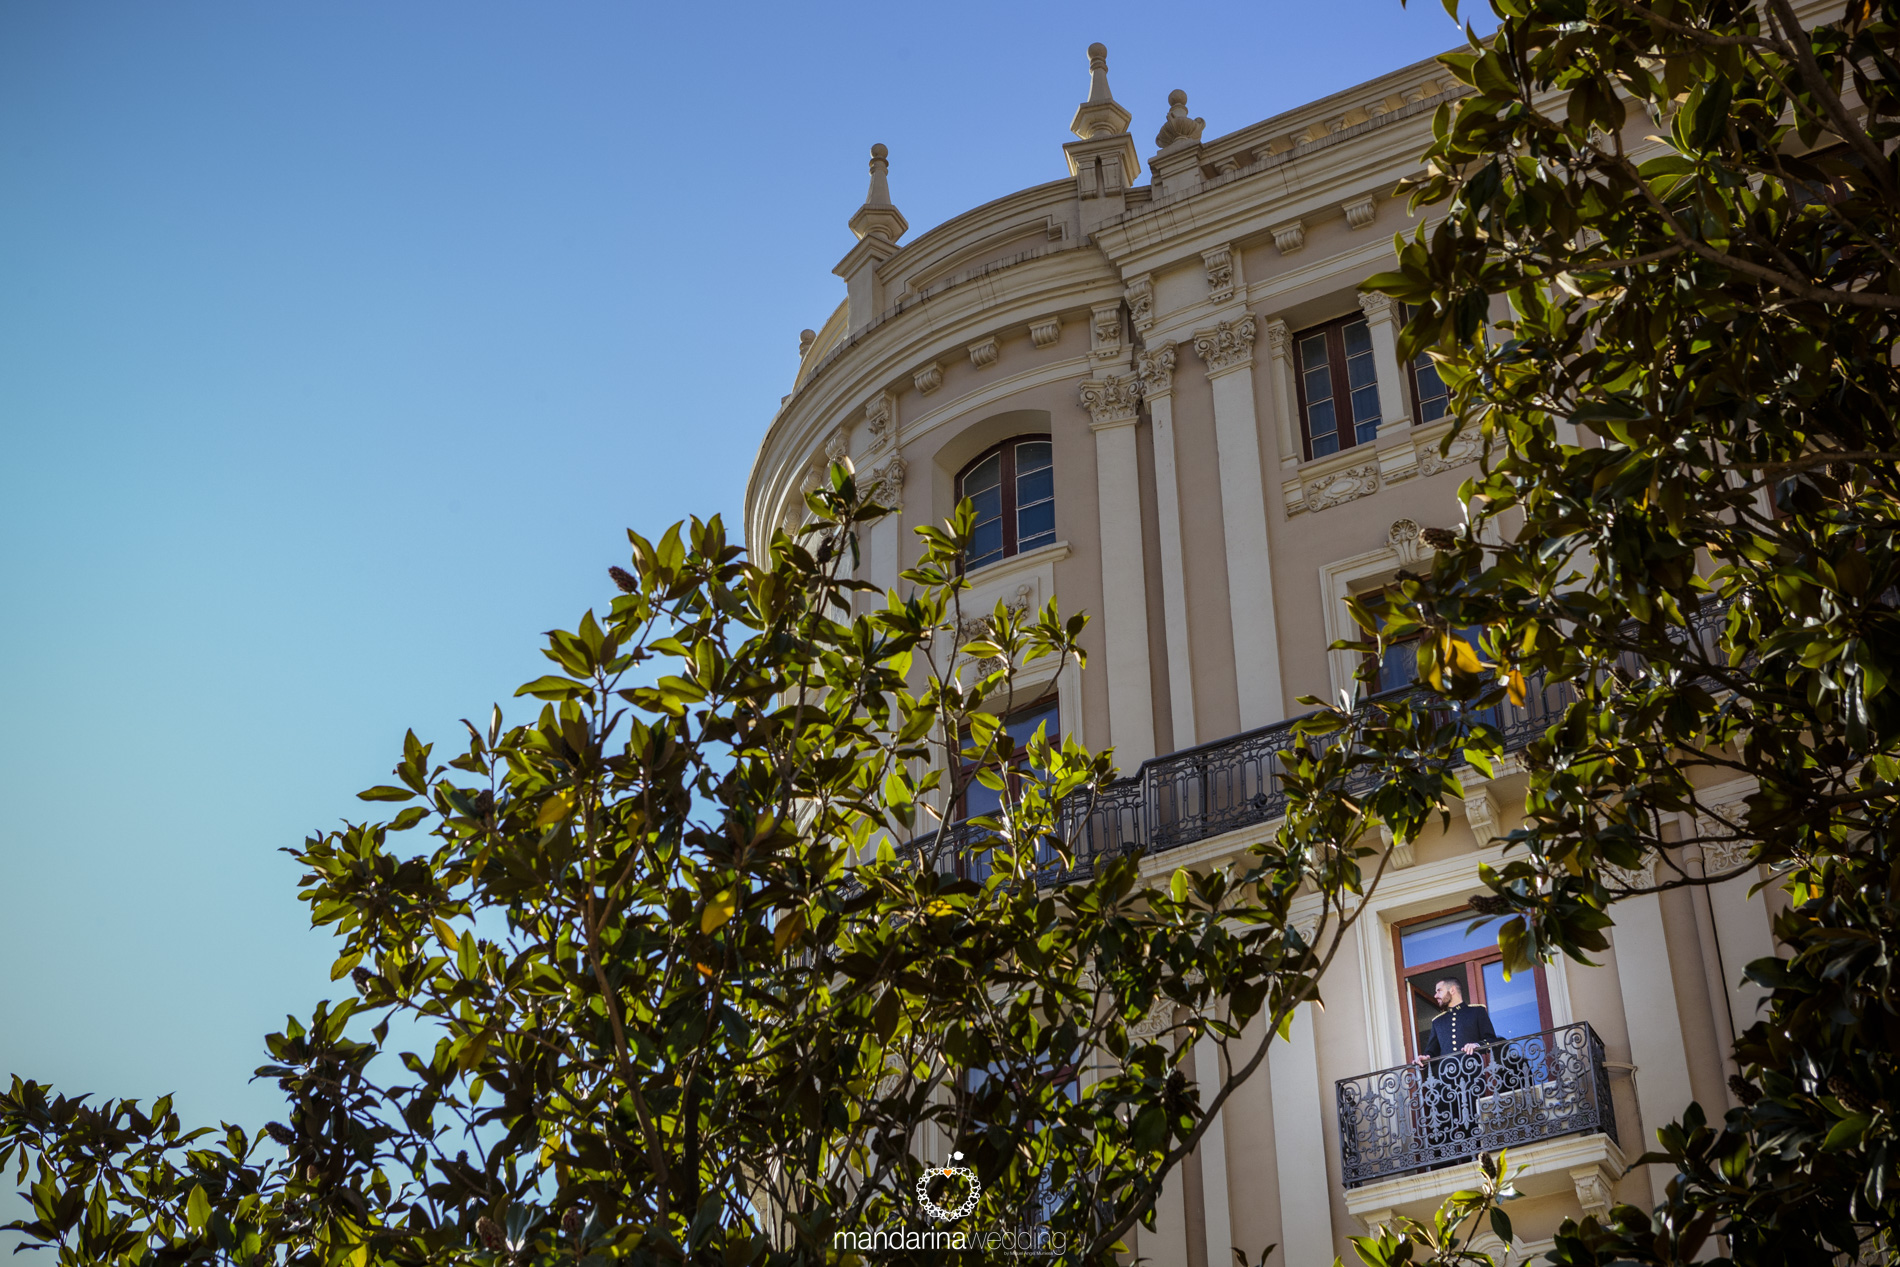 mandarina wedding, fotografos de boda, fotografo boda soria, fotografo boda barcelona, fotografo boda Madrid, fotógrafo boda lerida_11